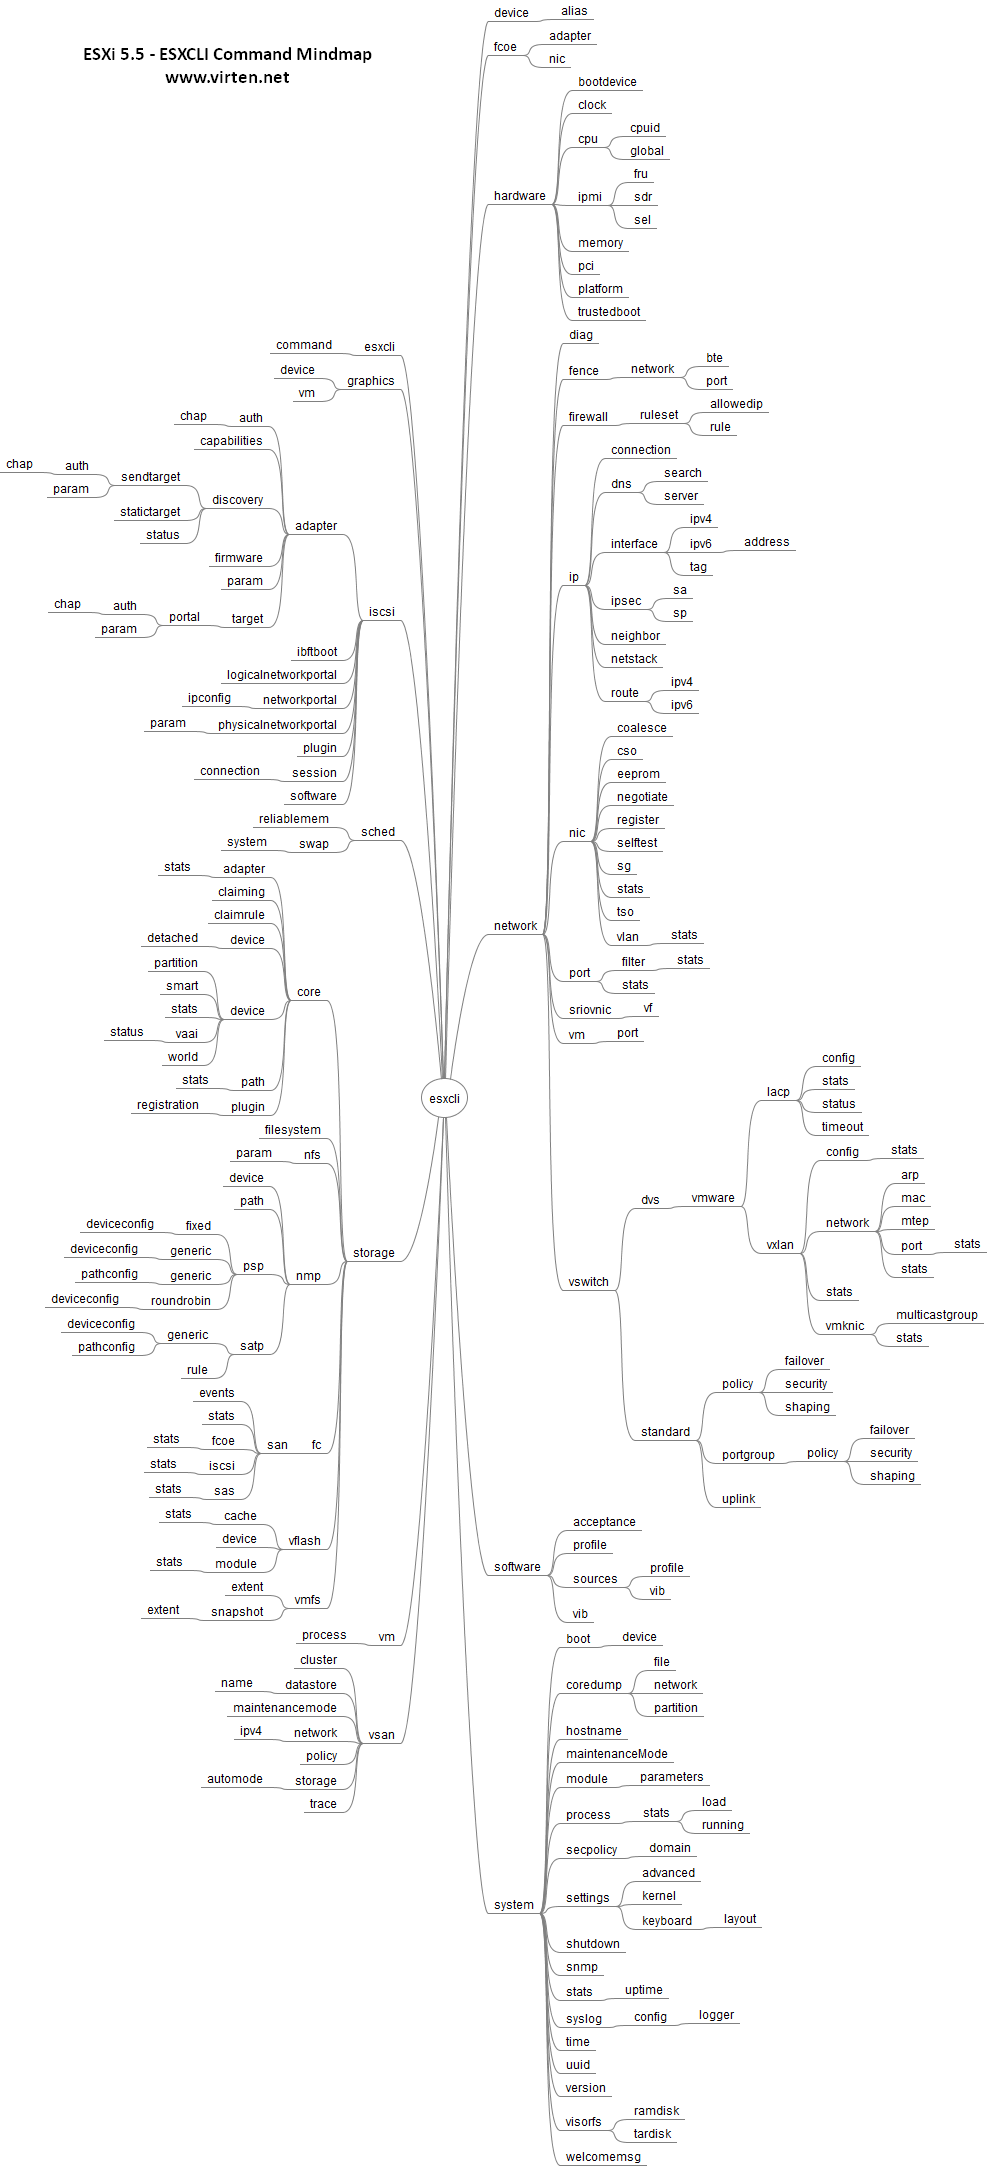 esxcli_55_command_mindmap